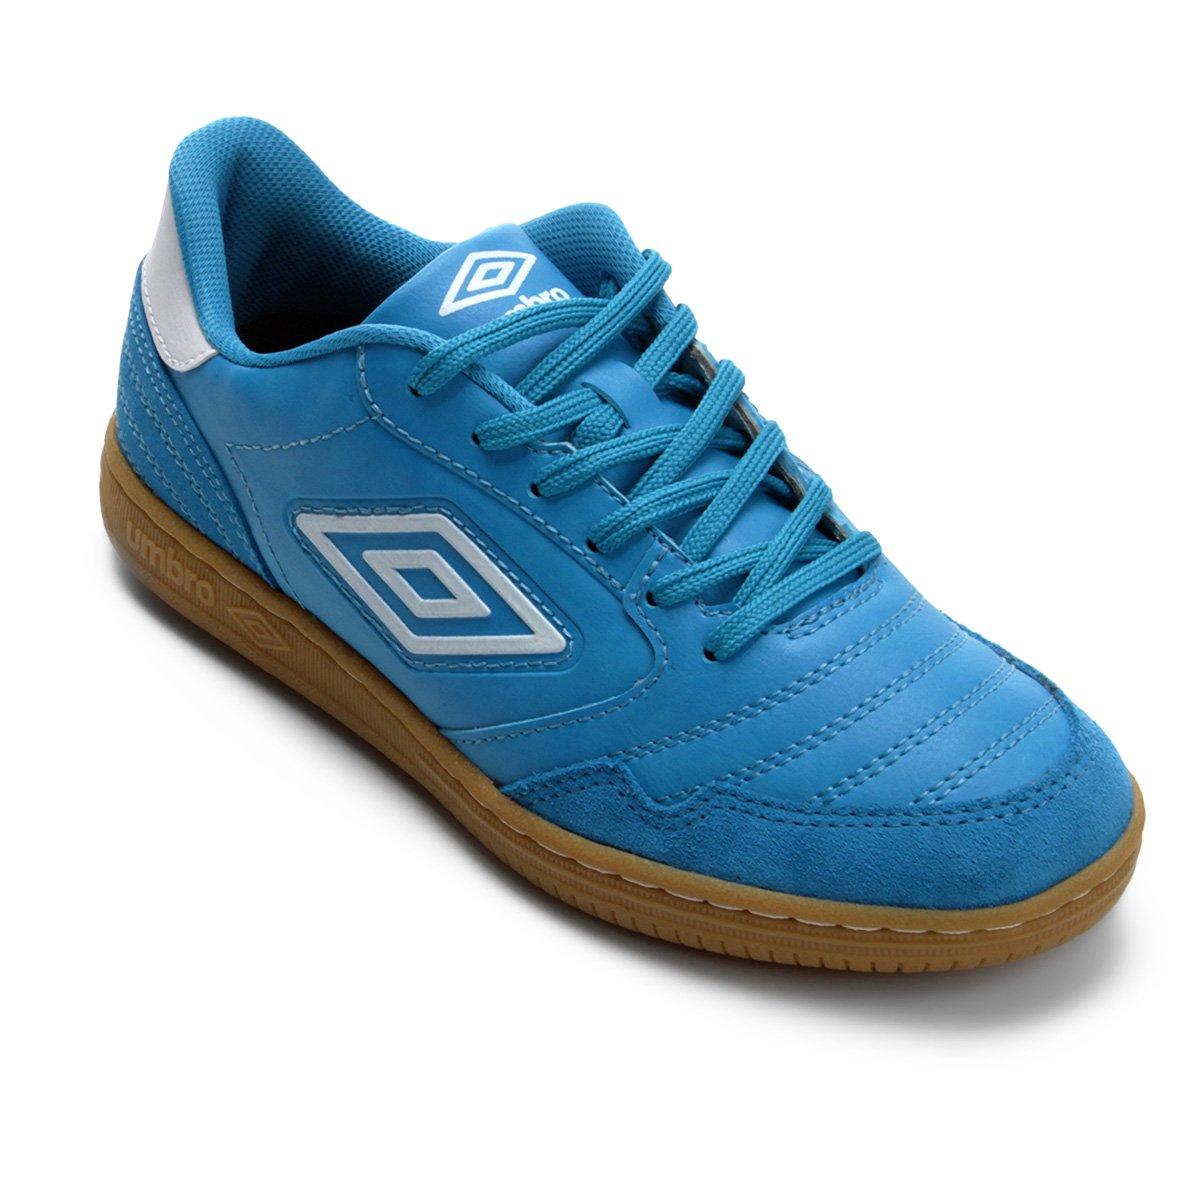 4aeec7a2d406a Chuteira Futsal Umbro Speciali F5 - Azul e Branco - Compre Agora ...